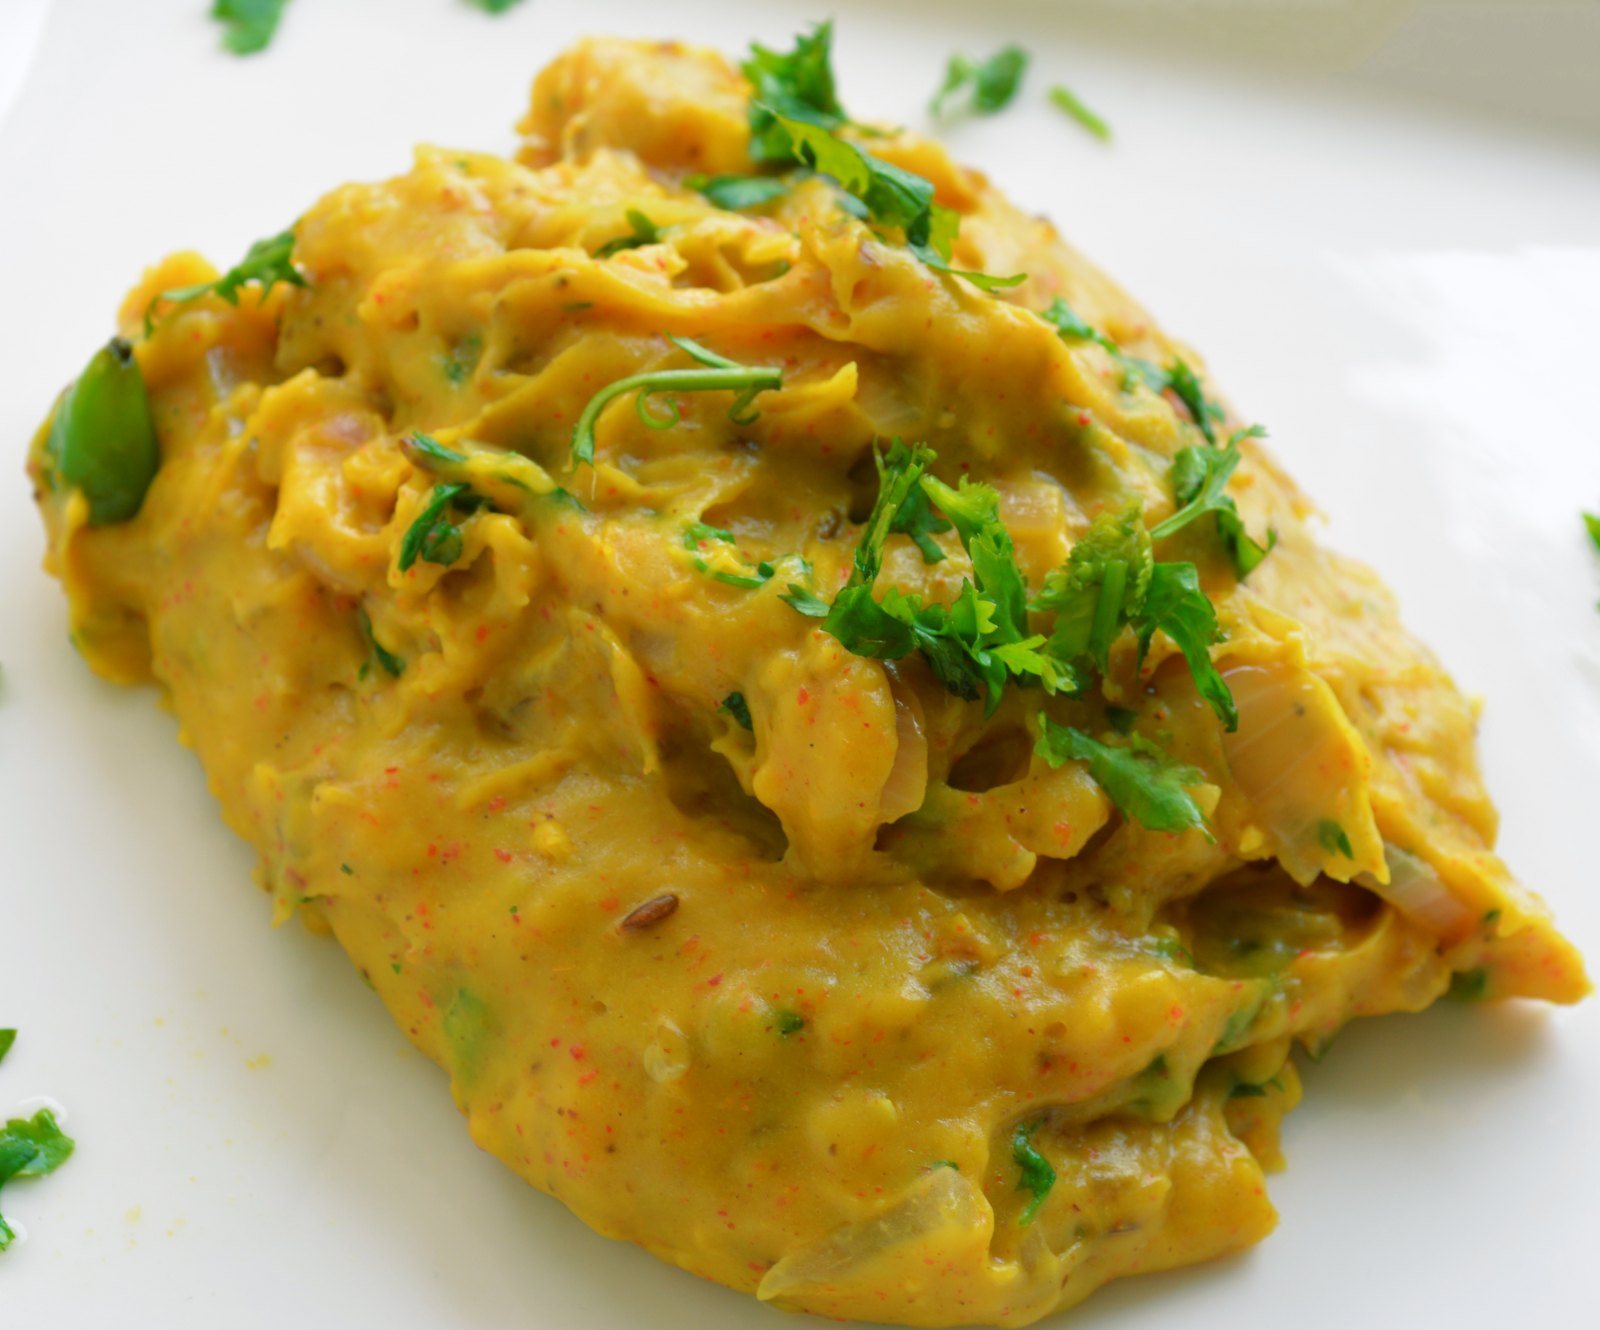 Rajasthani ghasela recipe besan ka pitta by archanas kitchen rajasthani ghasela recipe besan ka pitta forumfinder Choice Image